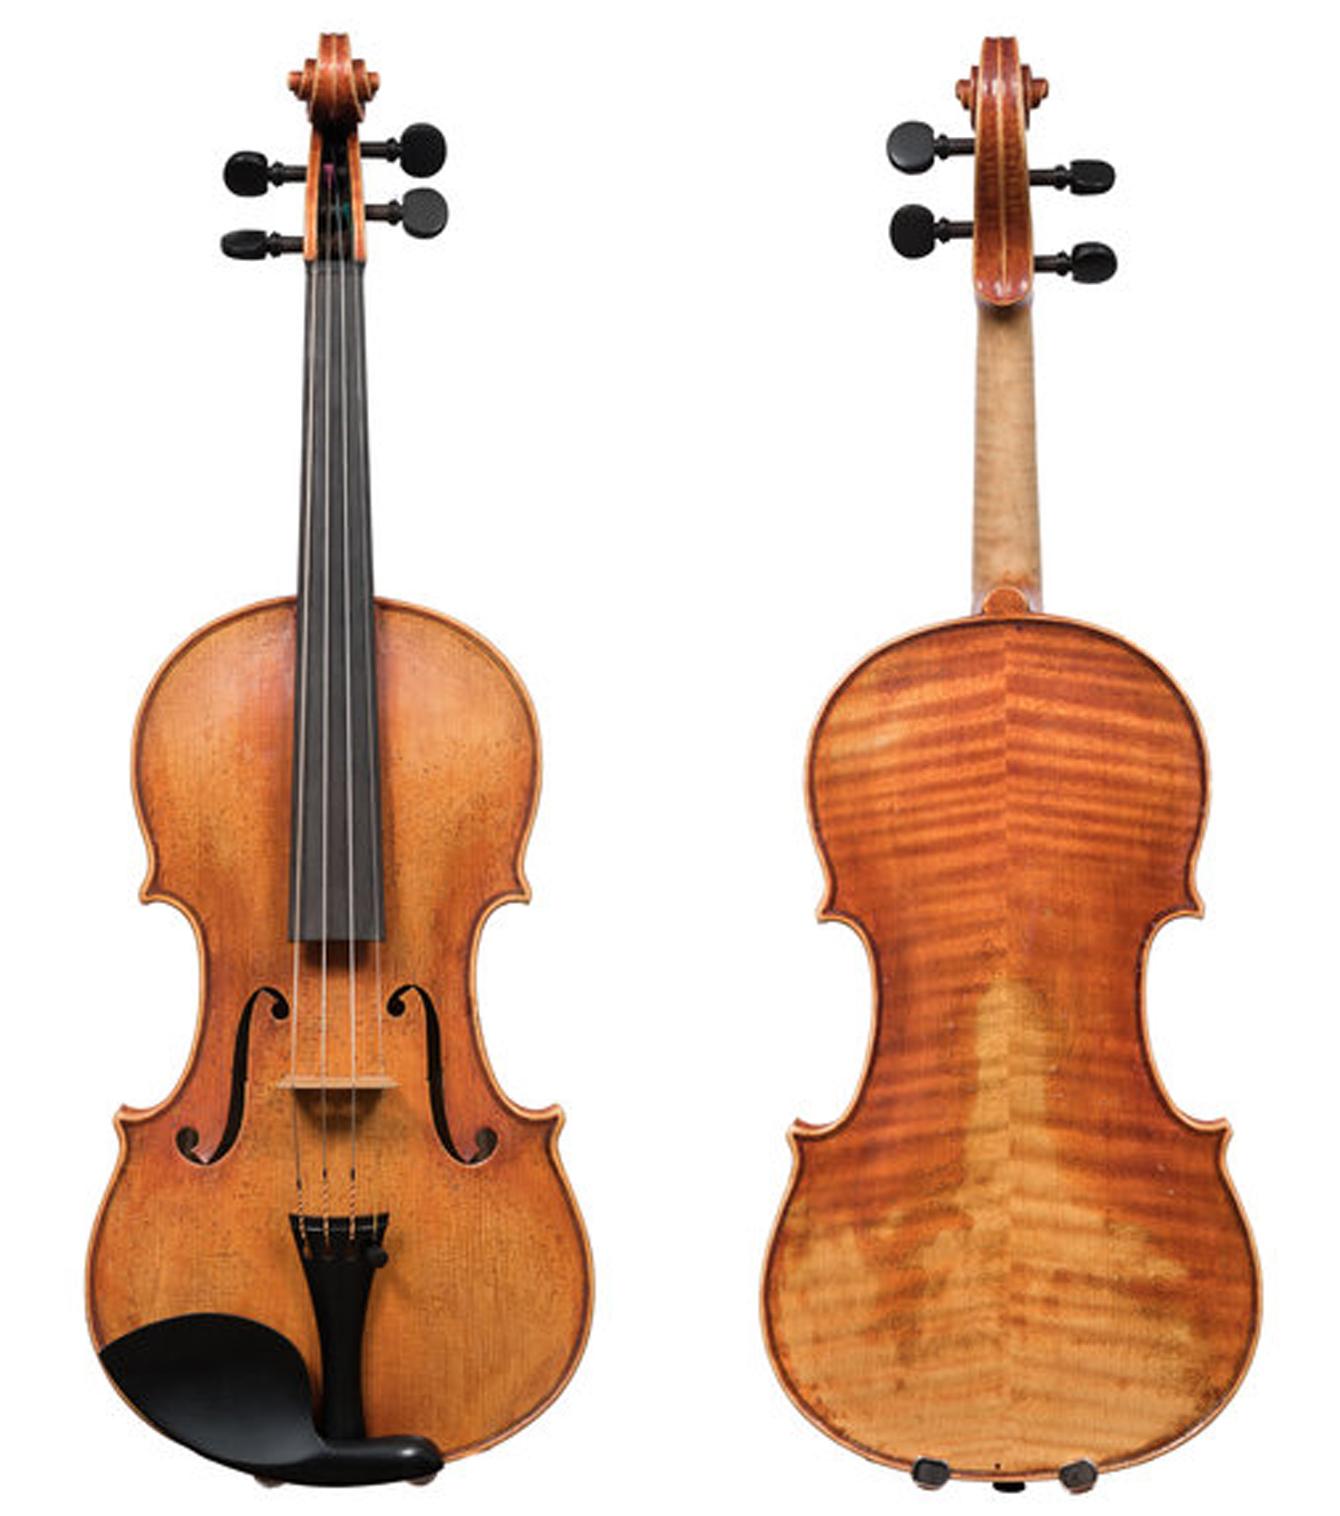 Henry Violin